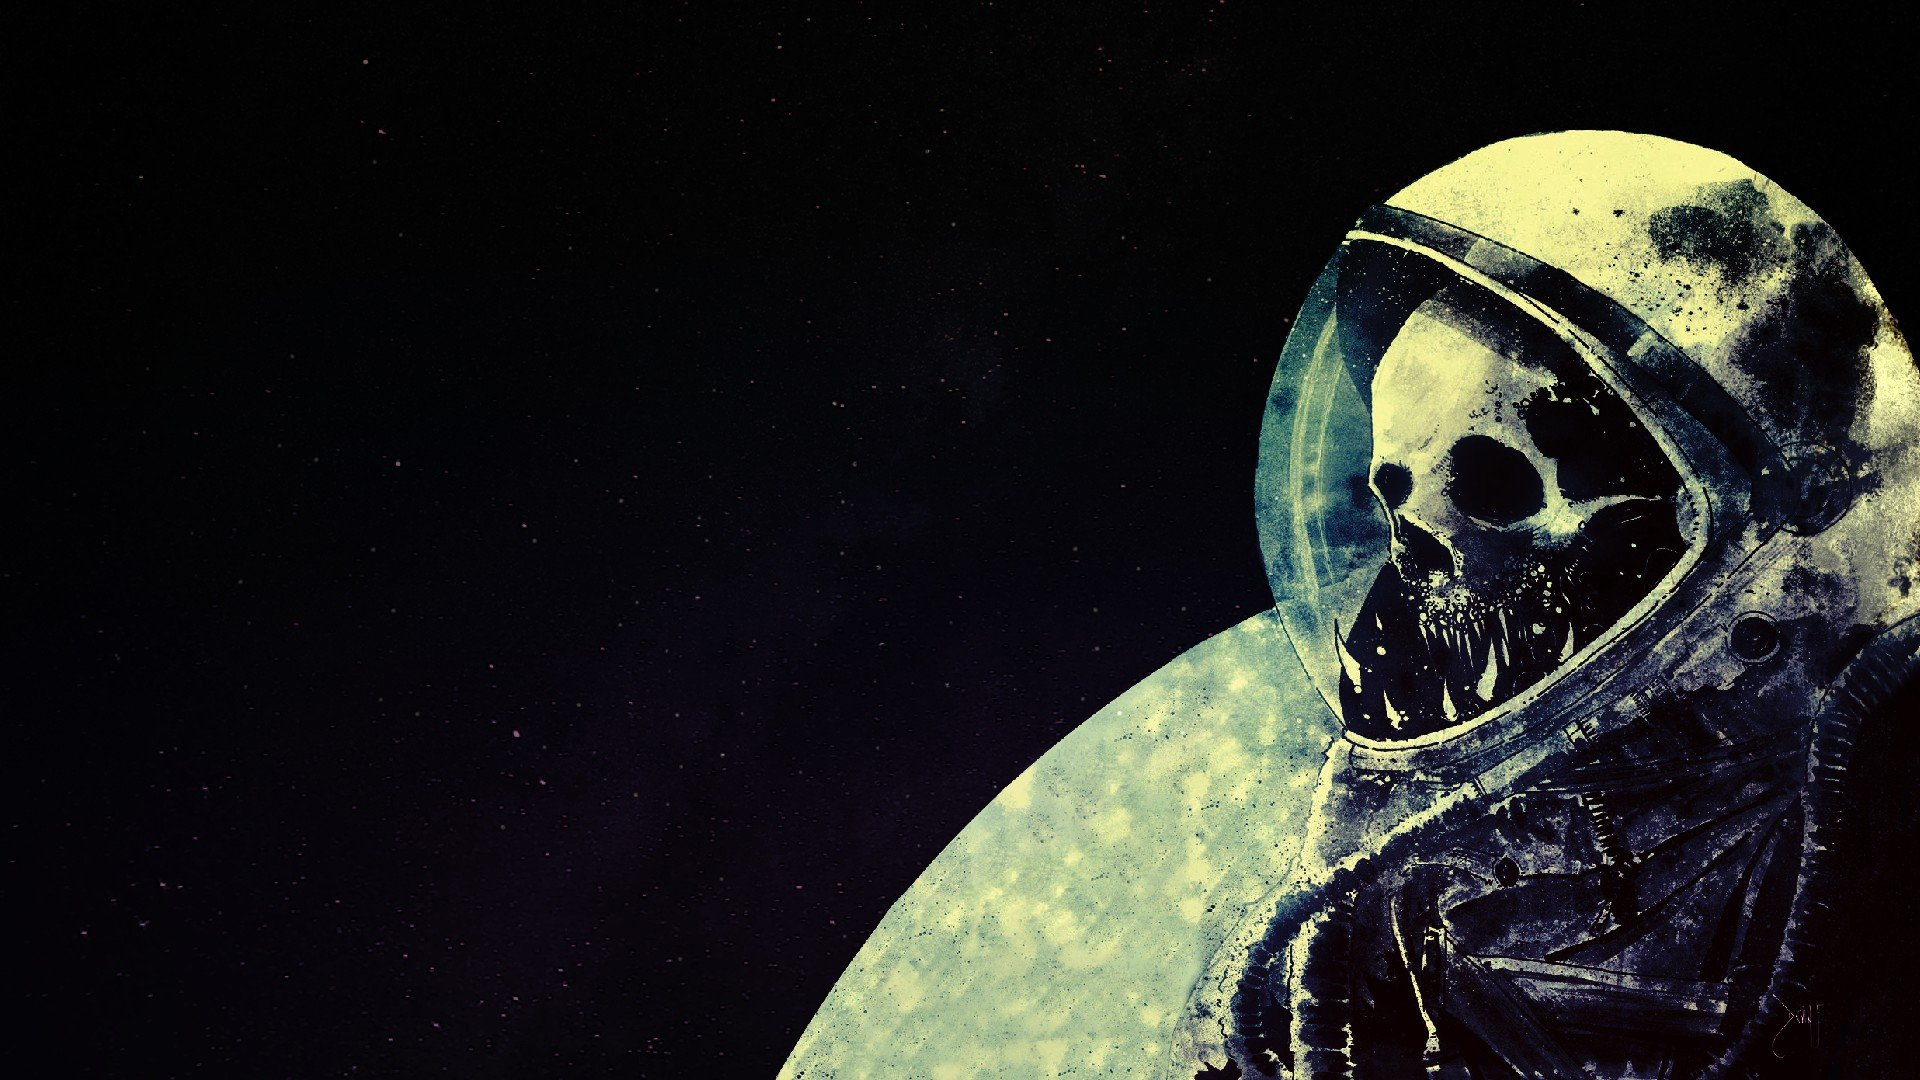 astronaut in space art - photo #40